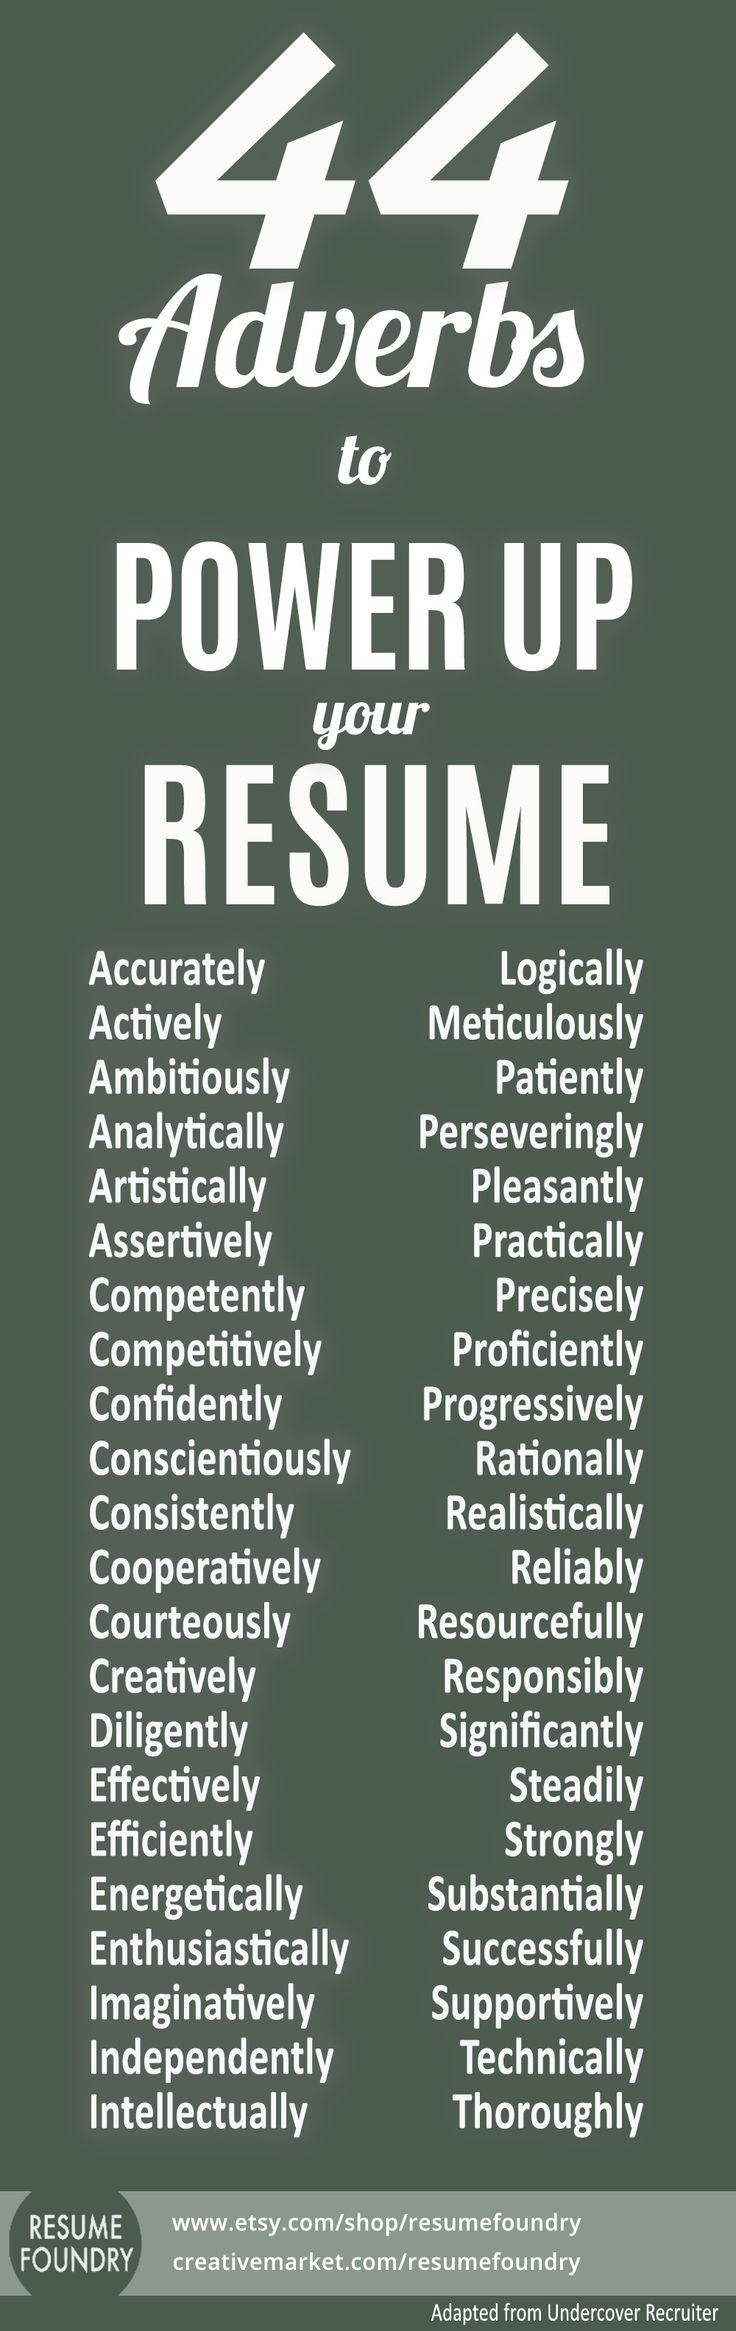 Resume tips, resume skill words, resume verbs, resume experience